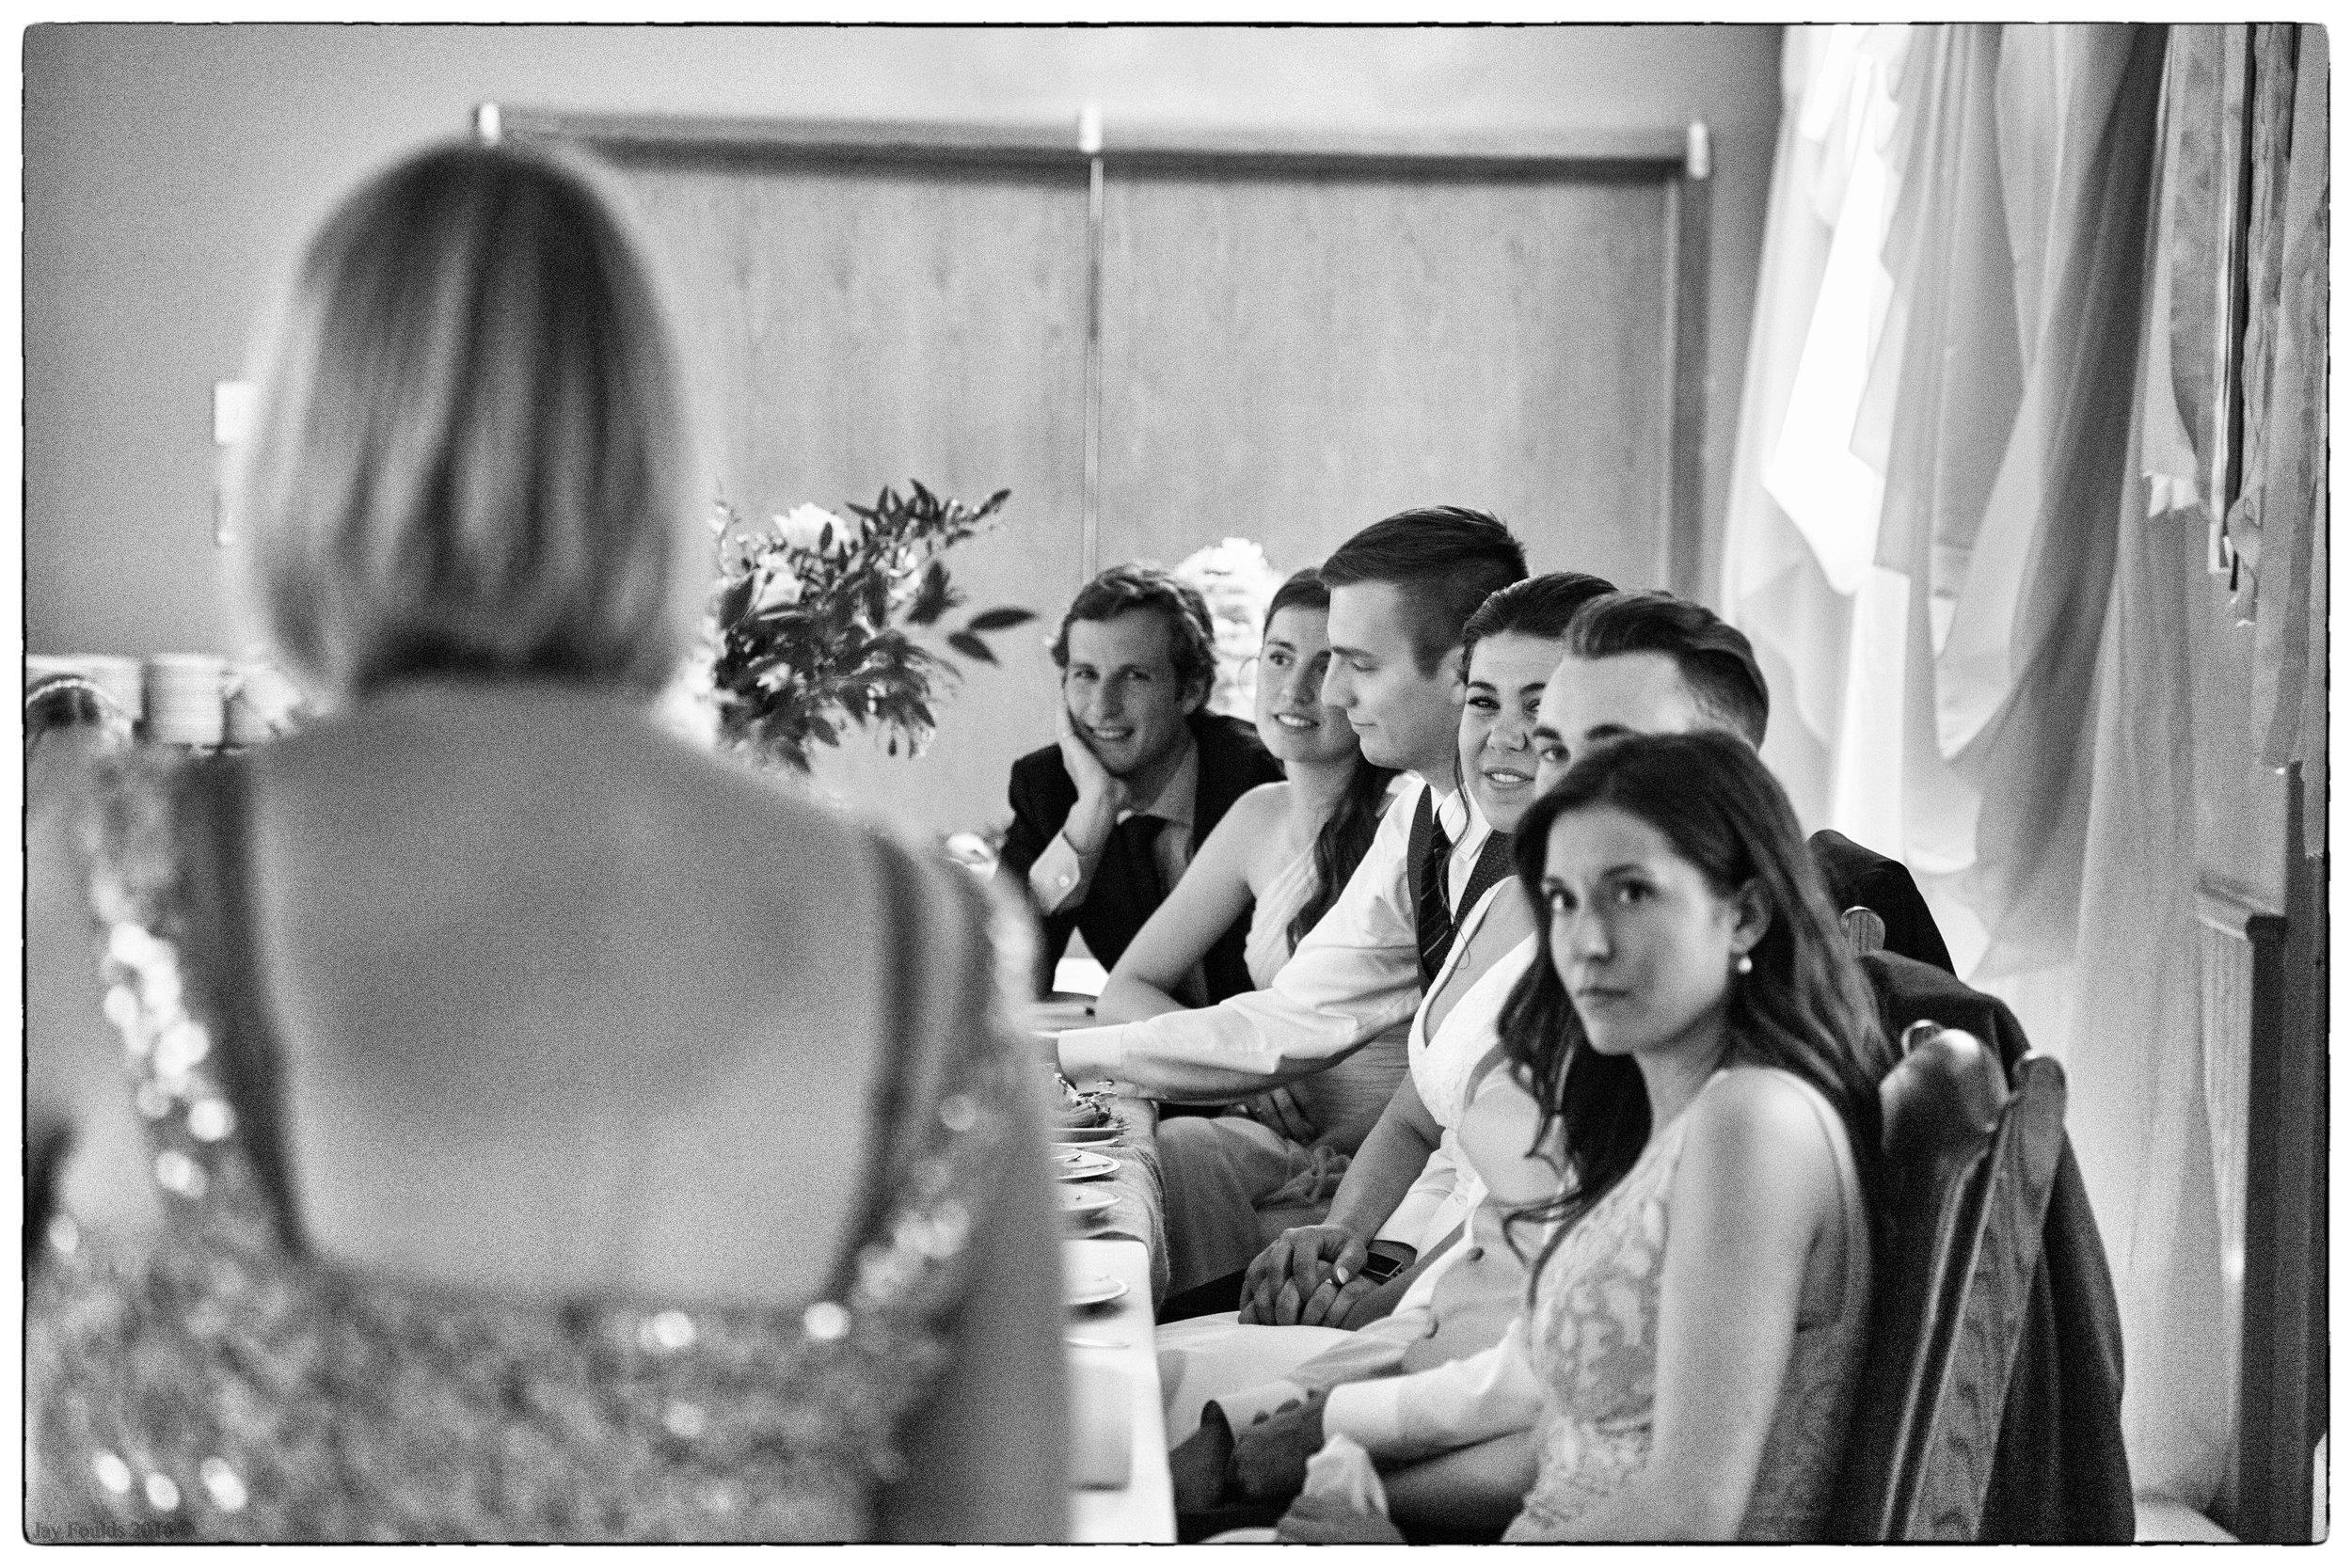 Halos - Jean Wedding - 02 July 2016 - The Celebration - 165 (fine art).JPG